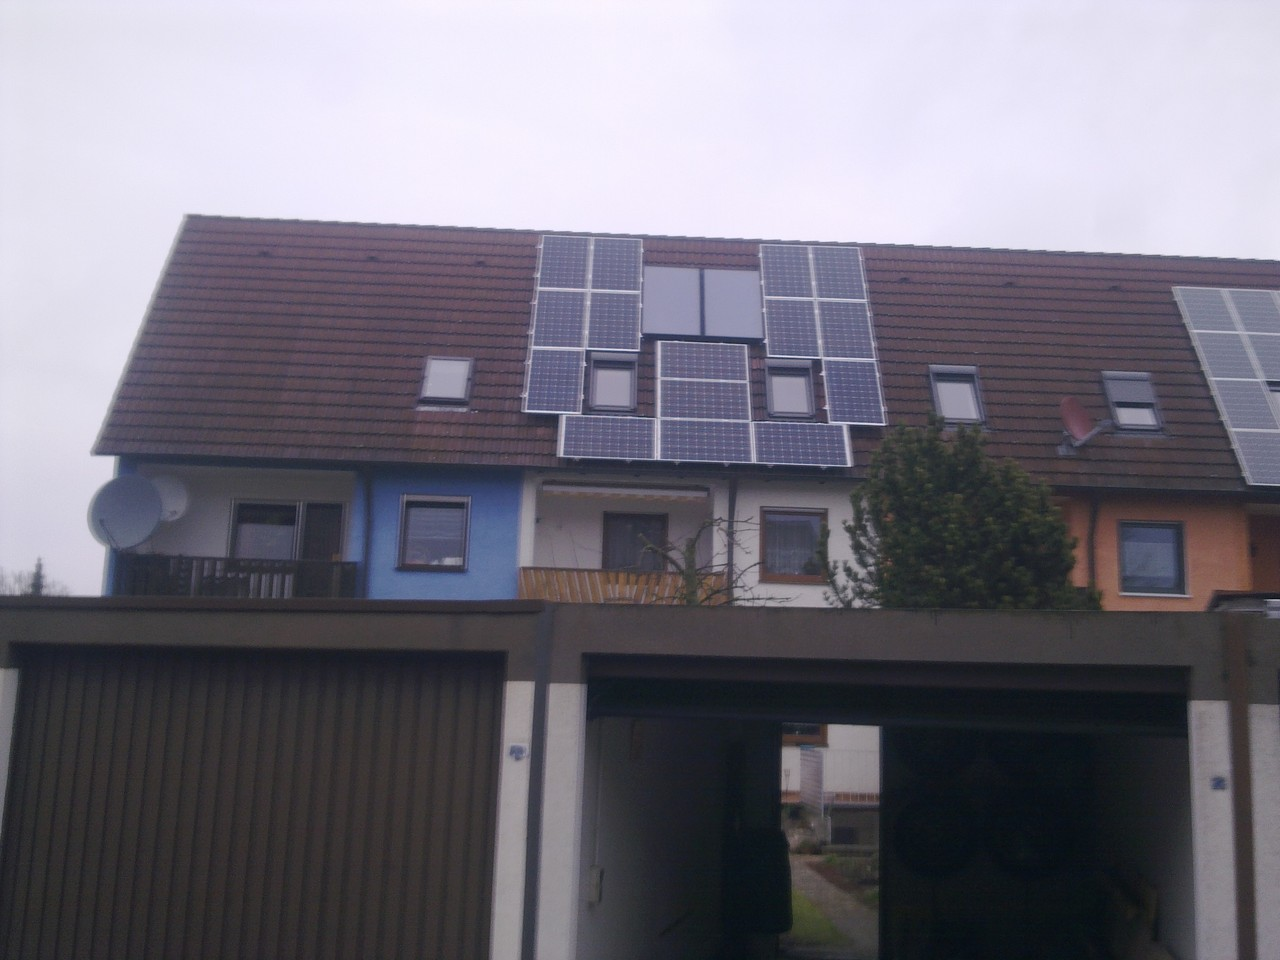 93073 Neutraubling 4,05 kWp Photovoltaikanlage